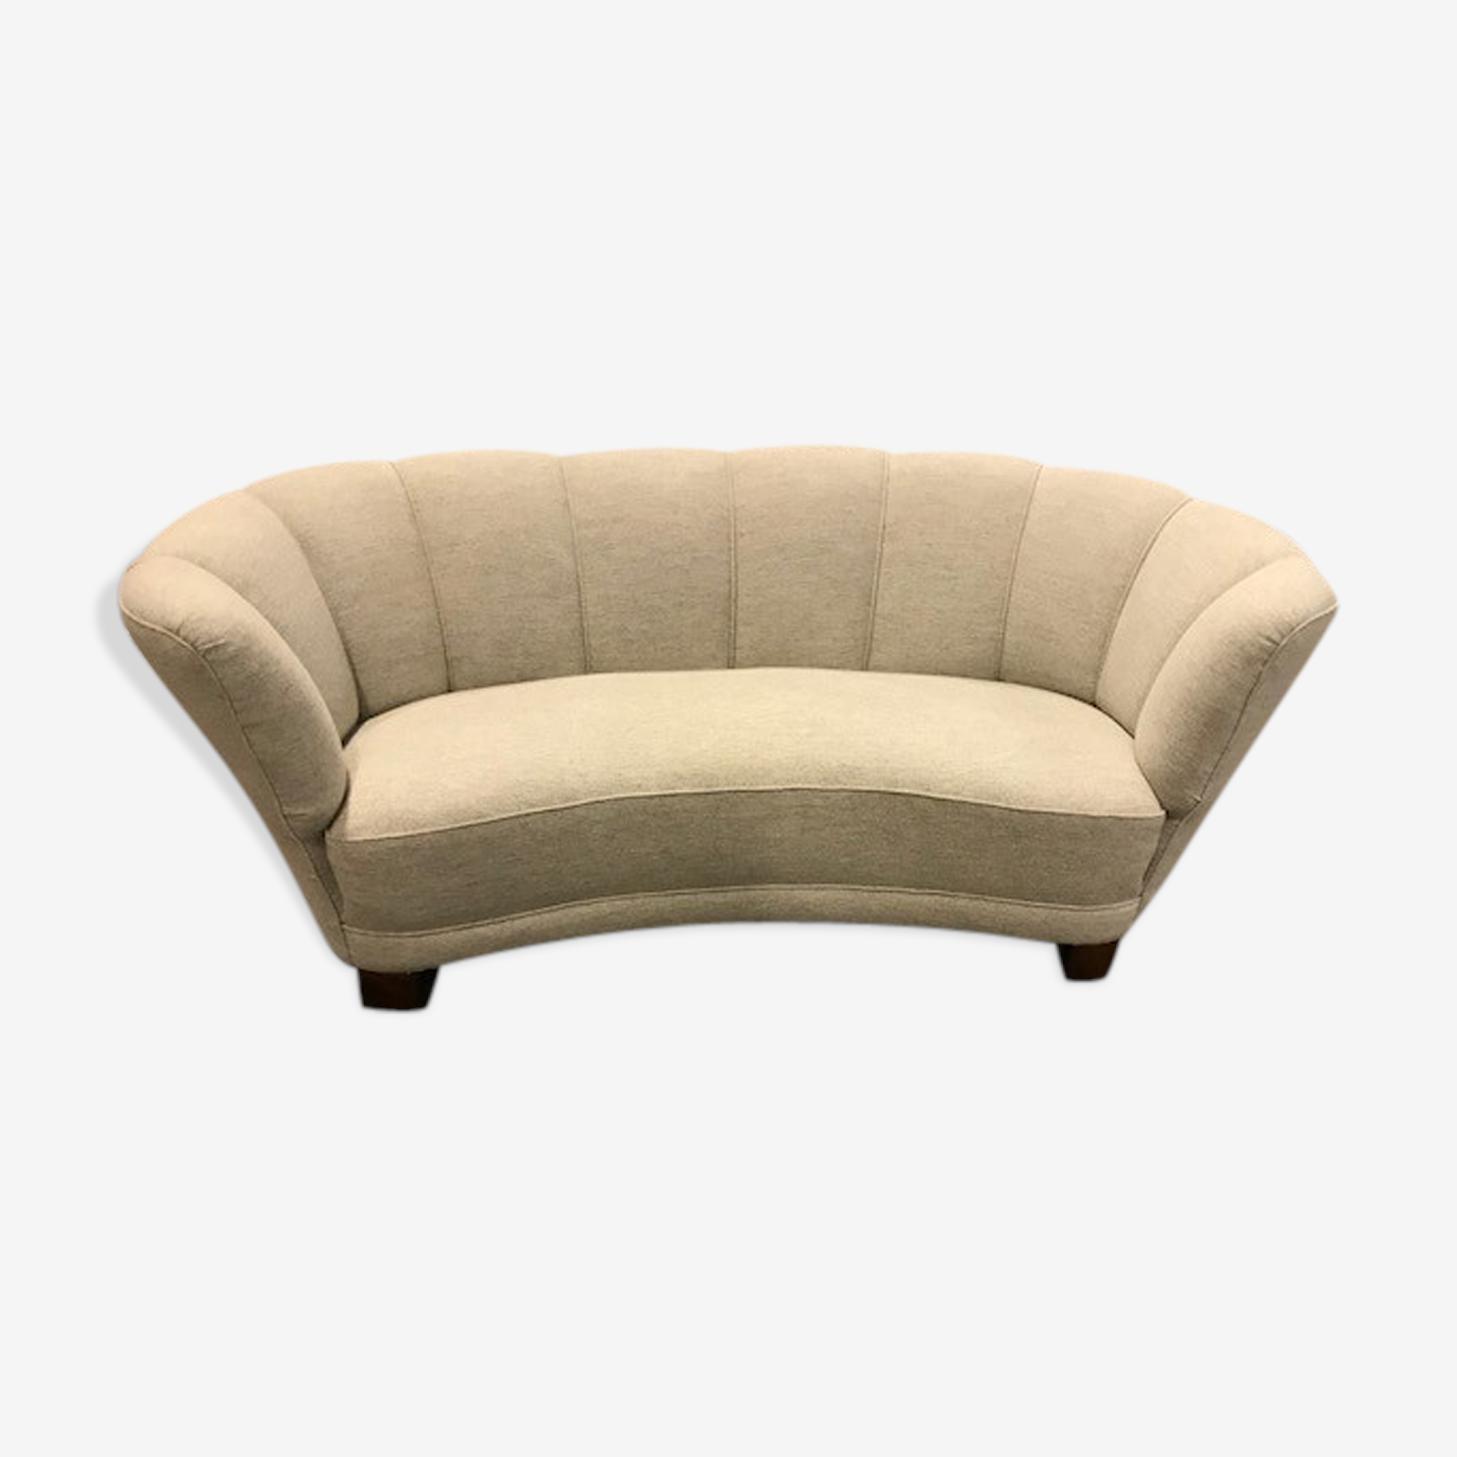 Scandinavian sofa from the 50s